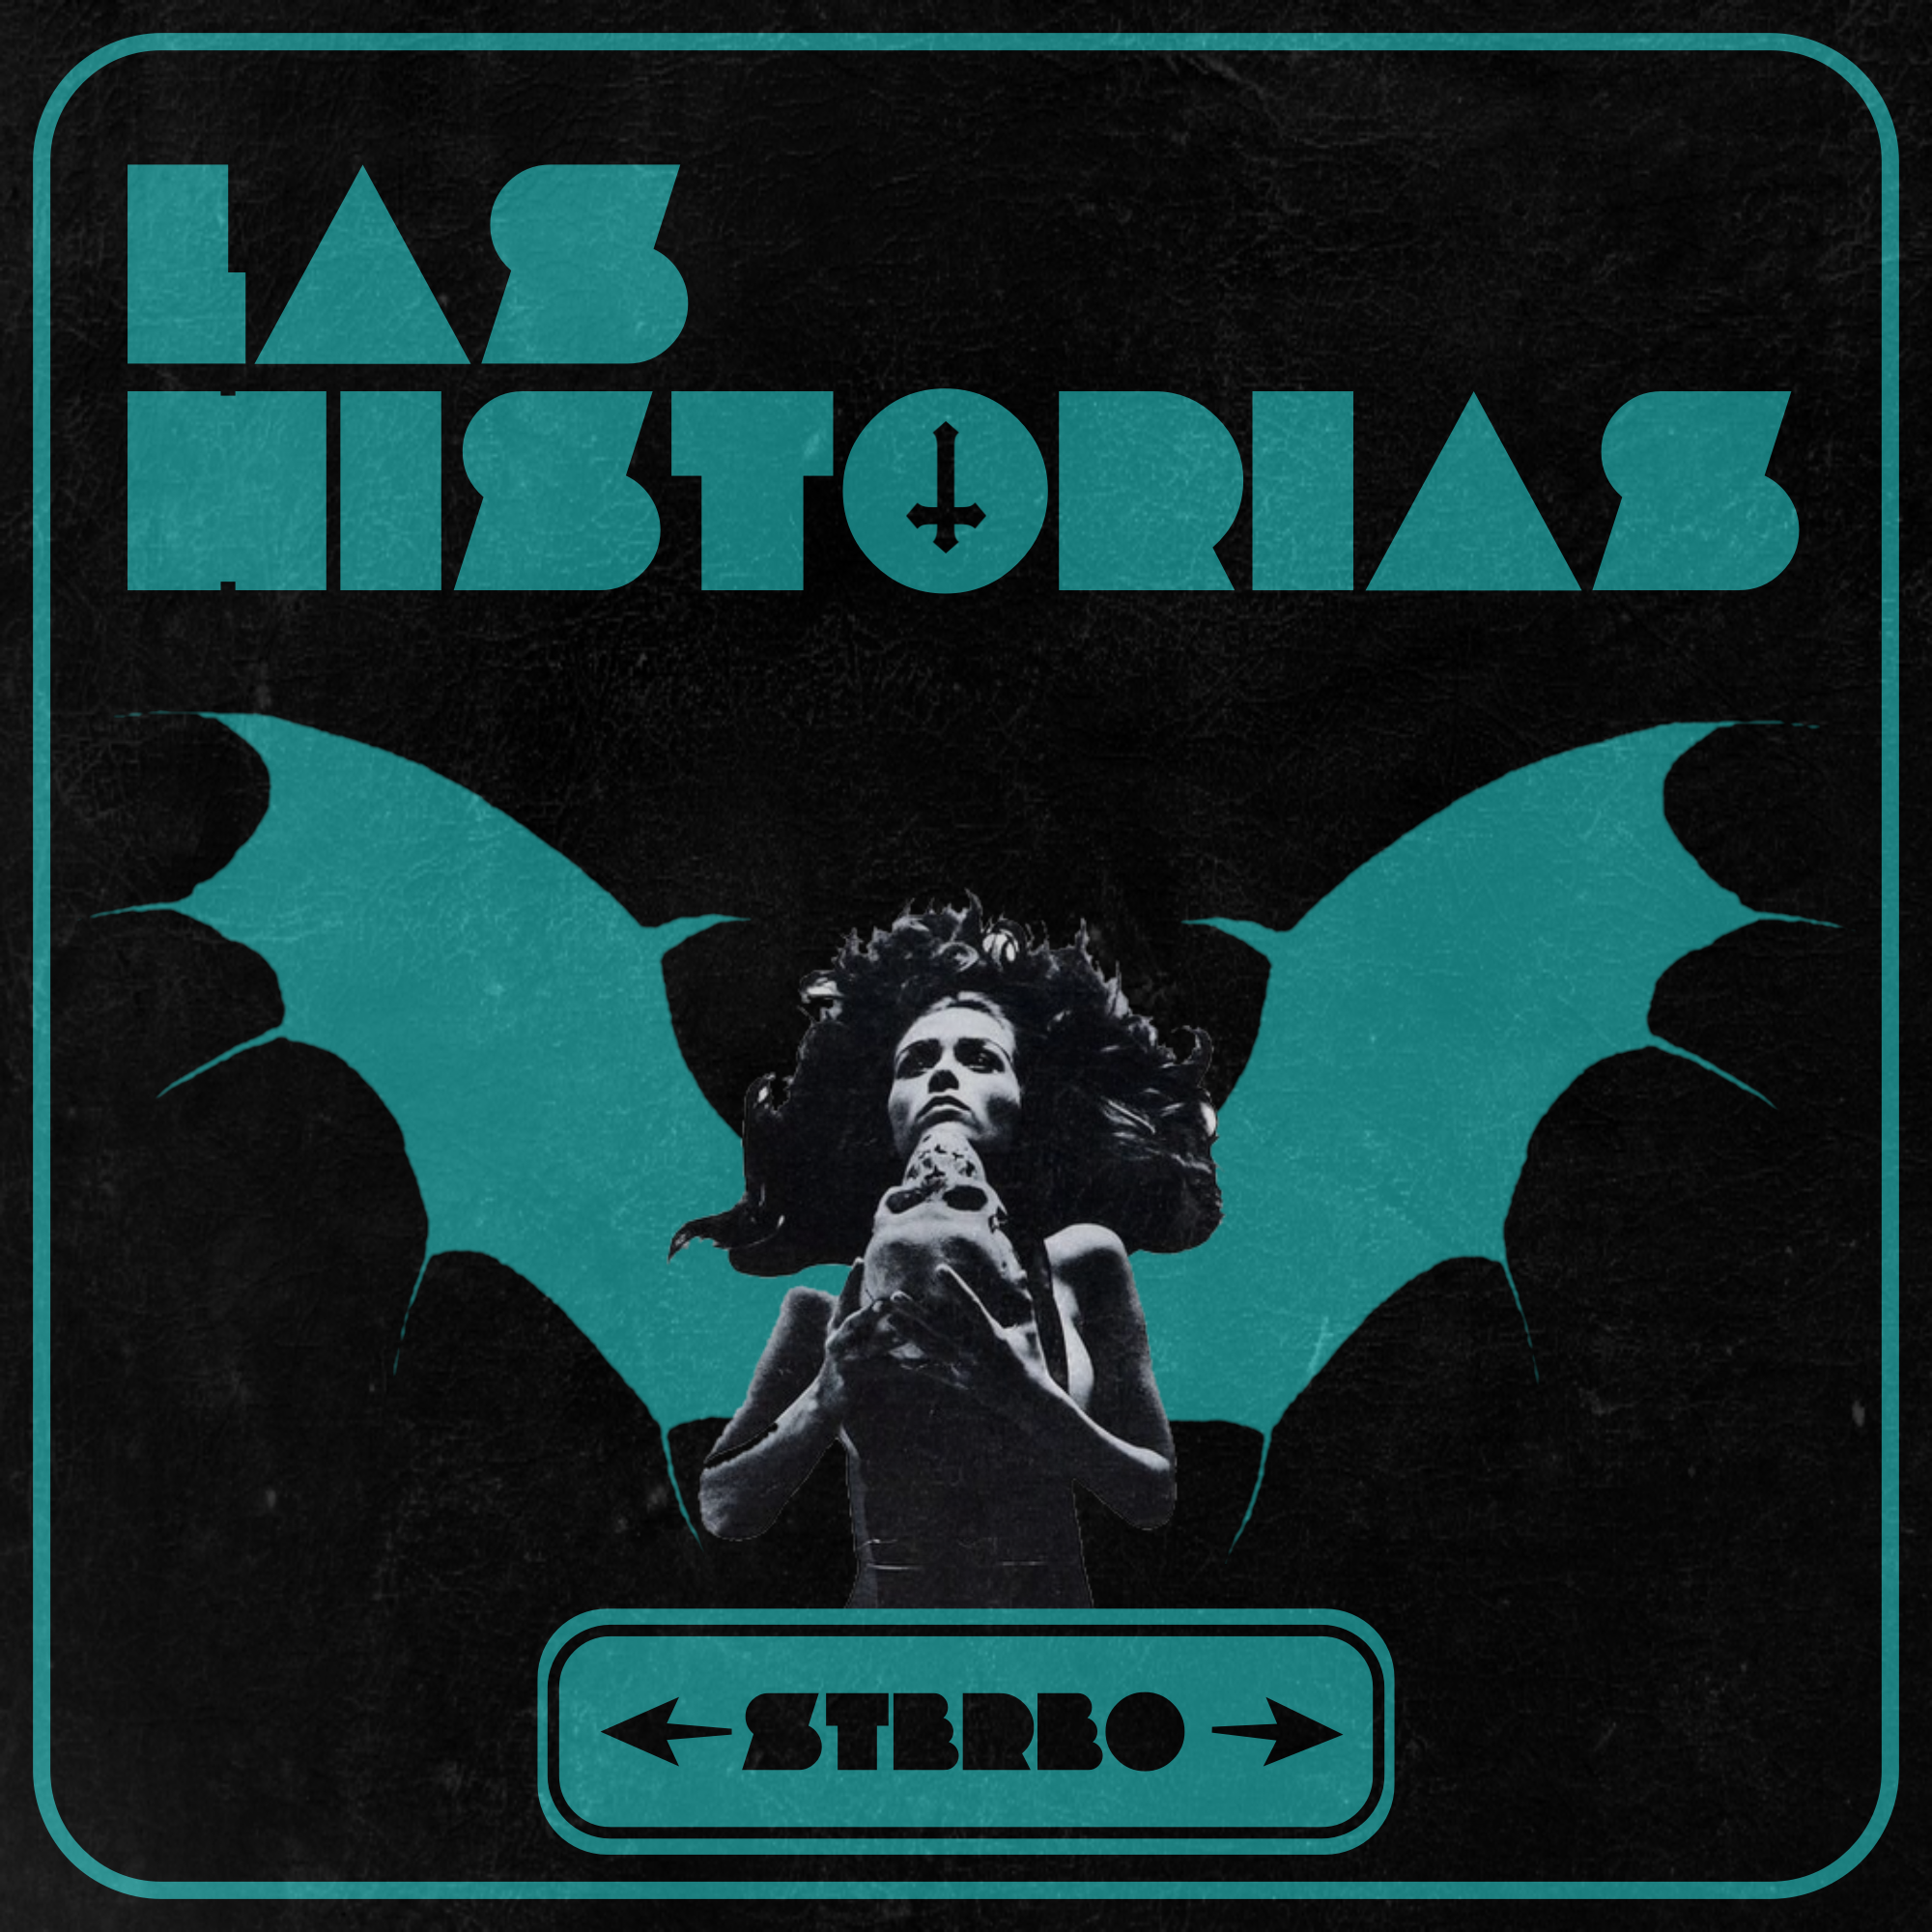 Las Historias LP Insert